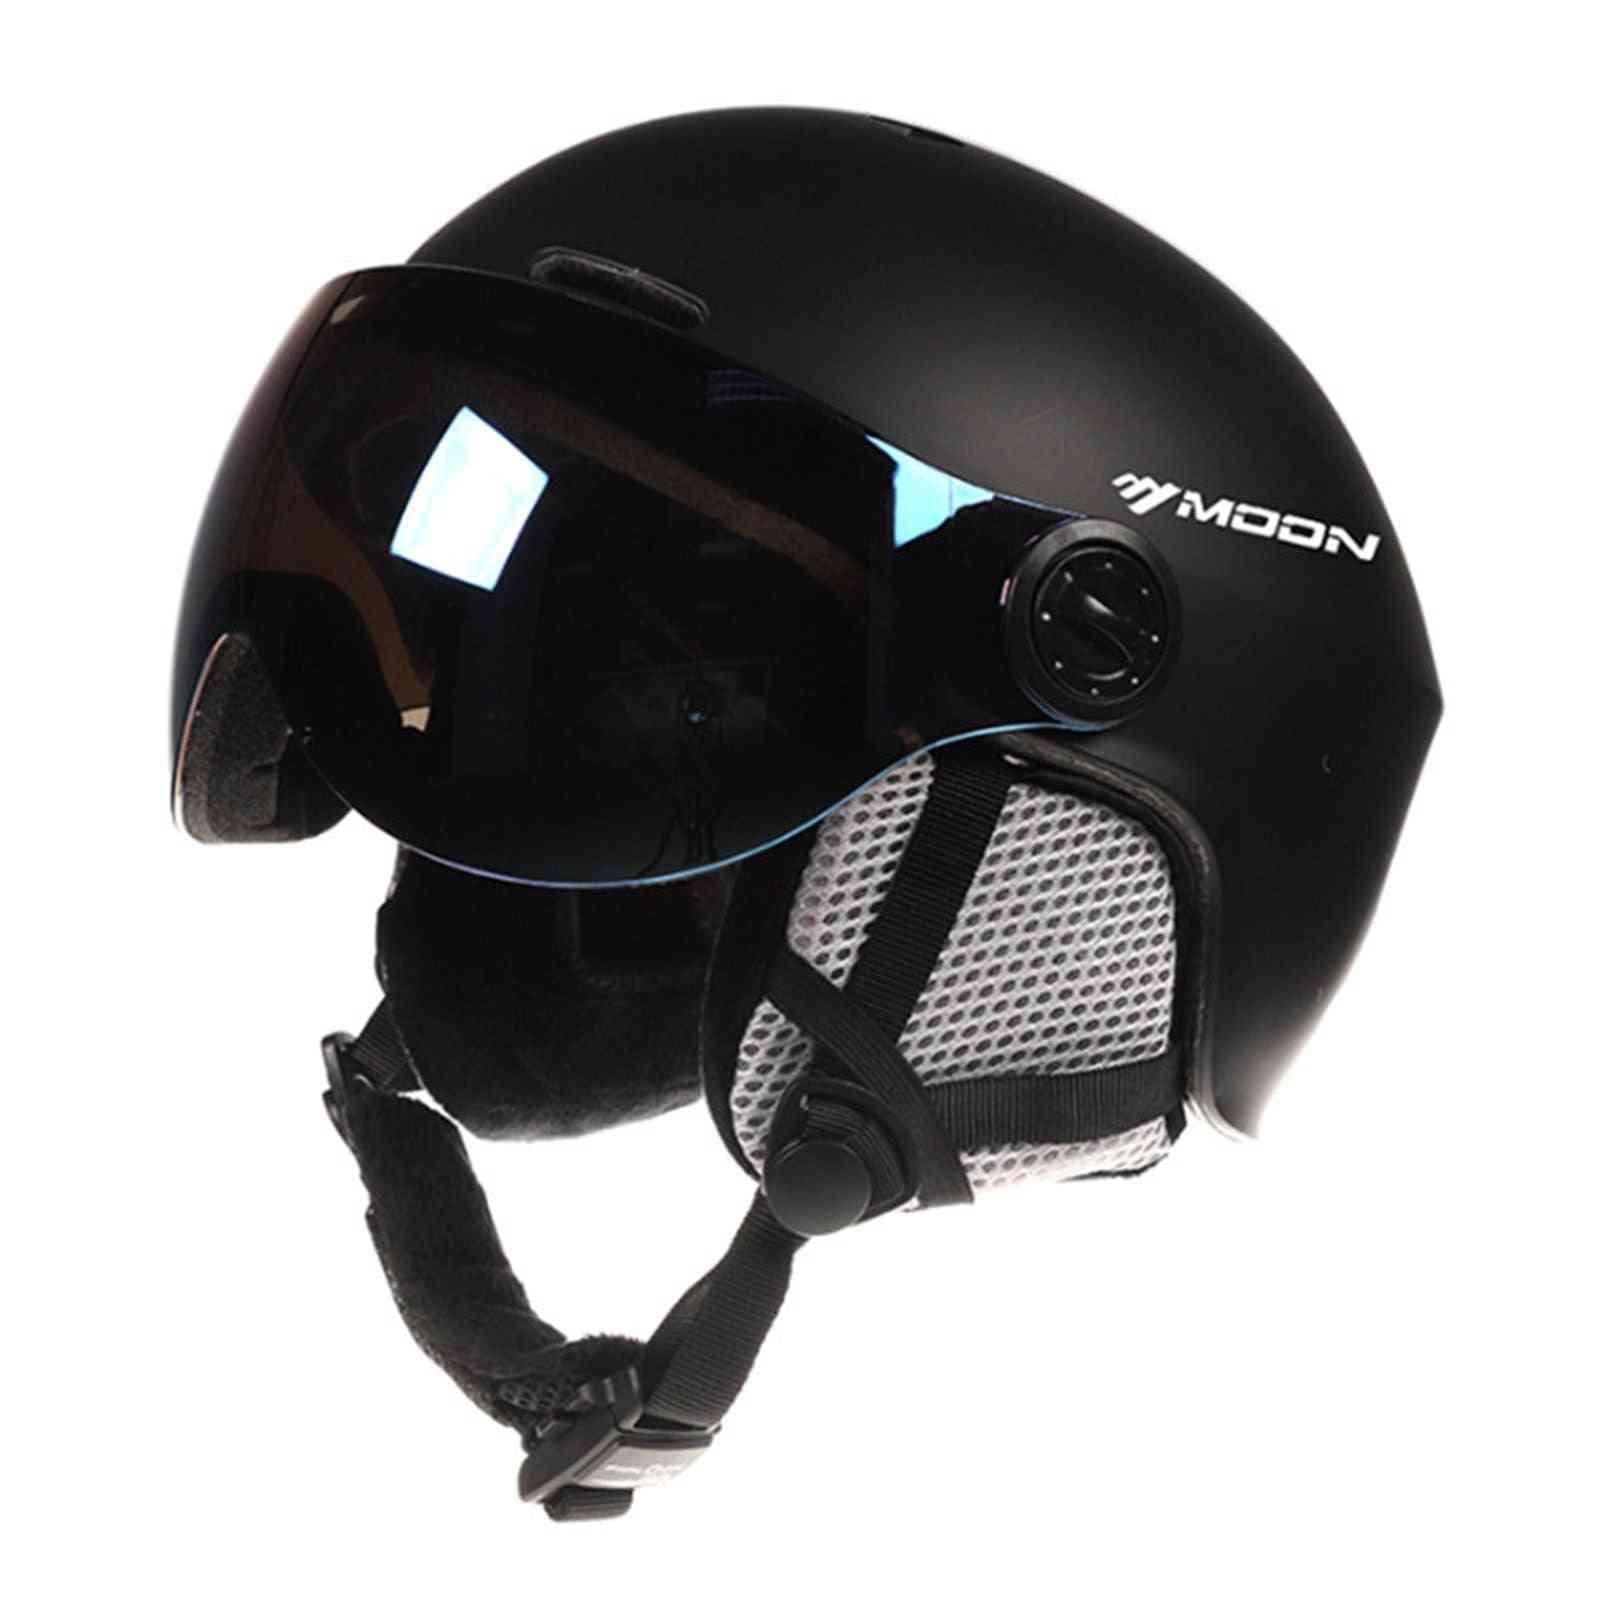 Ski Snowboard Helmet With Goggles